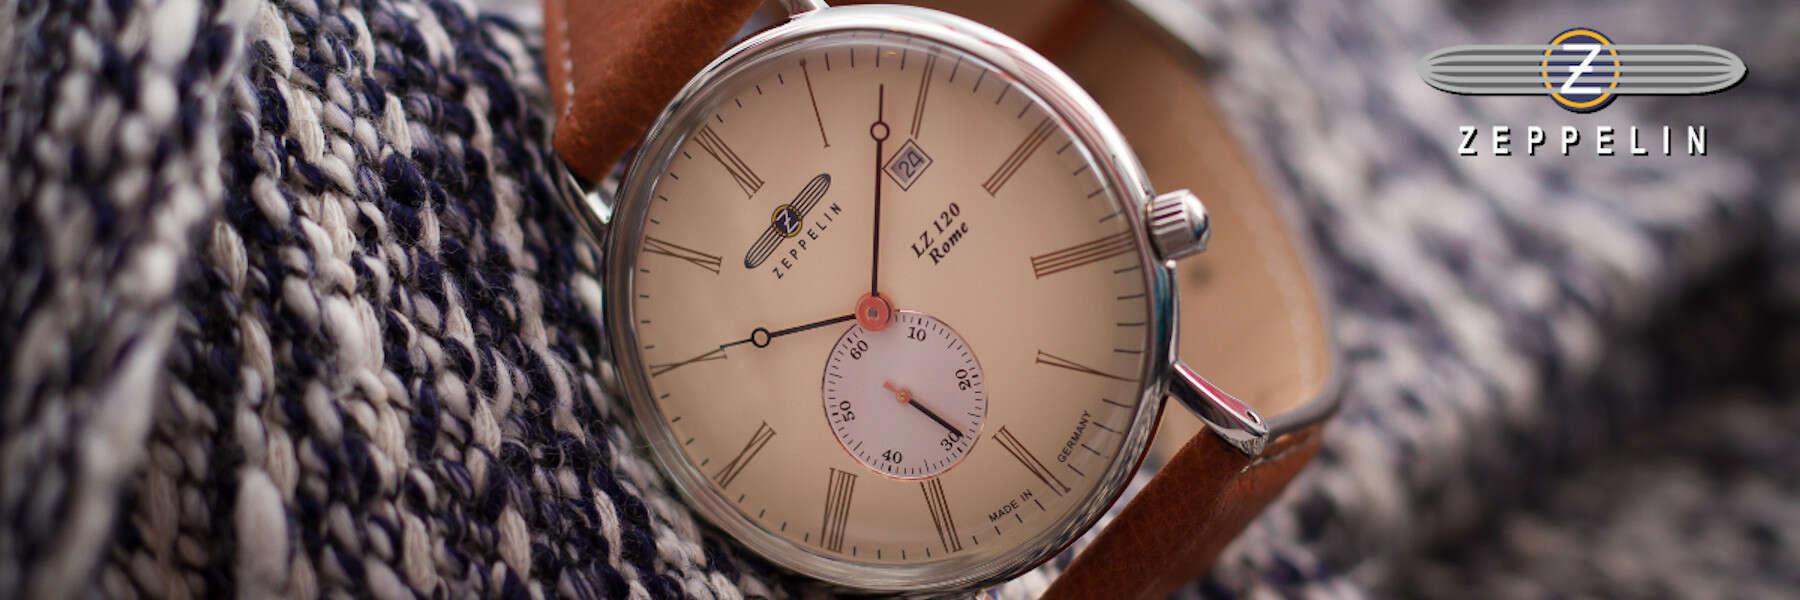 Uhren Daniel Heckmann - Zeppelin